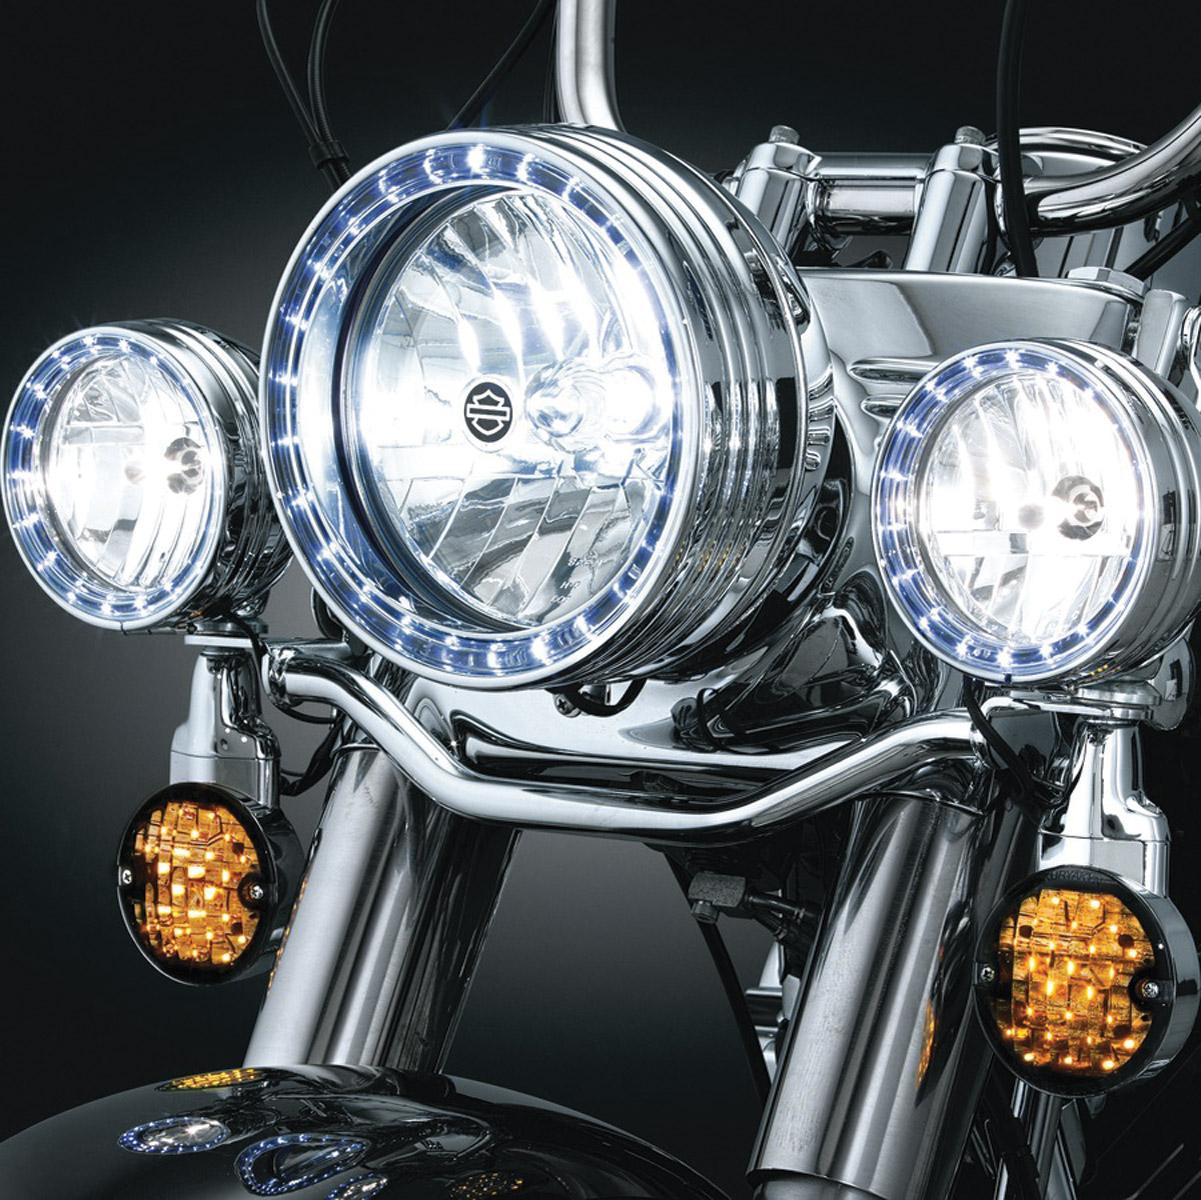 kuryakyn 4 1 2 led halo chrome passing lamp trim ring 446 512